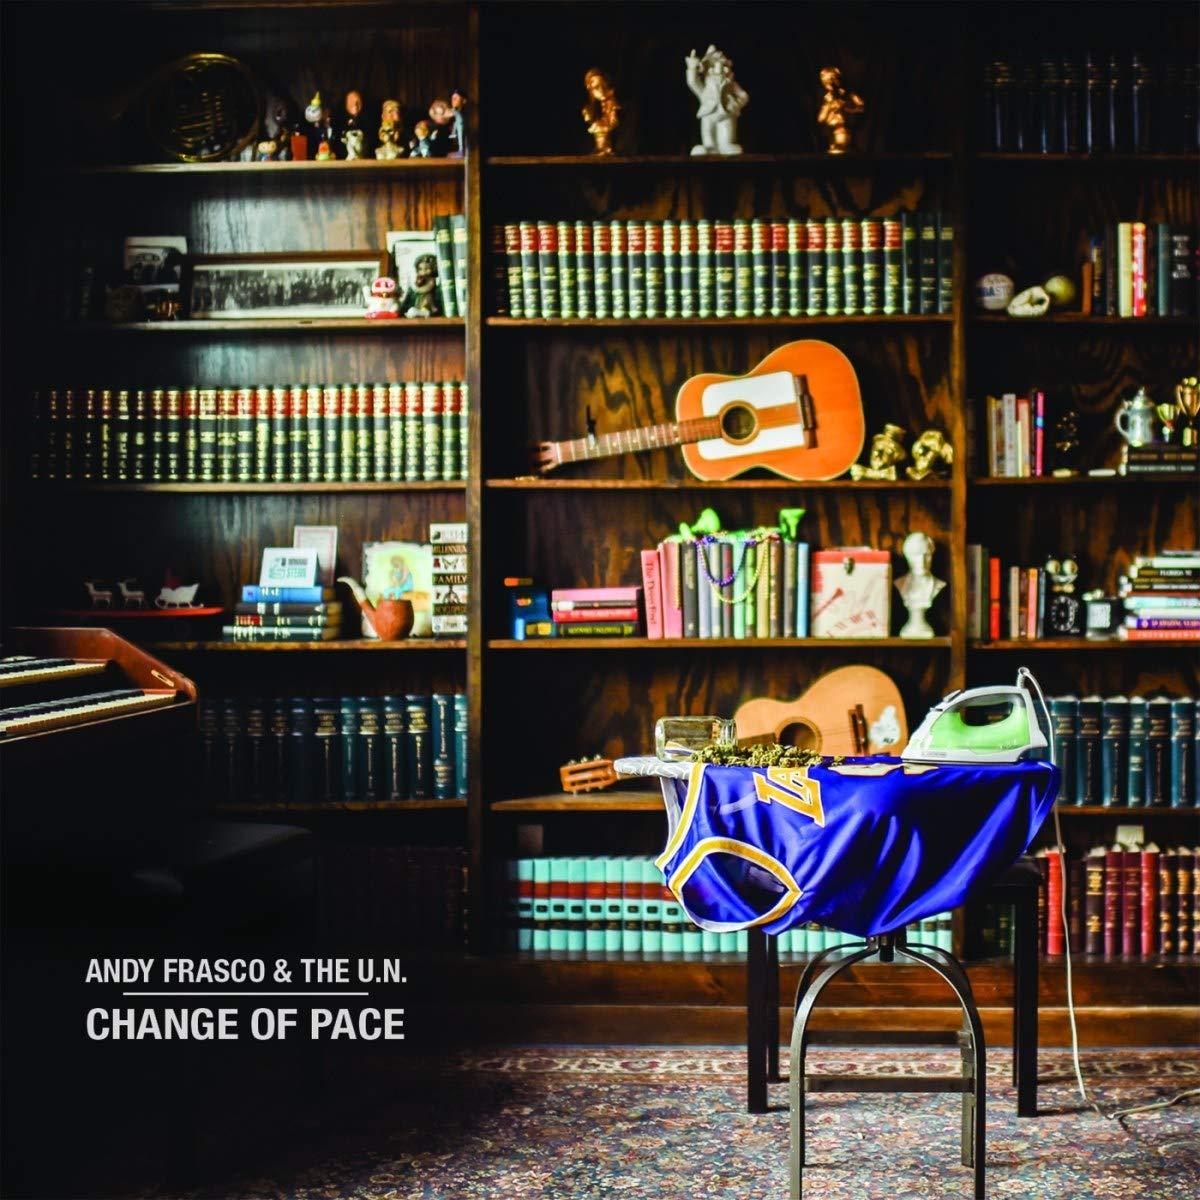 Vinilo : ANDY FRASCO & THE U.N. - Change Of Pace (LP Vinyl)